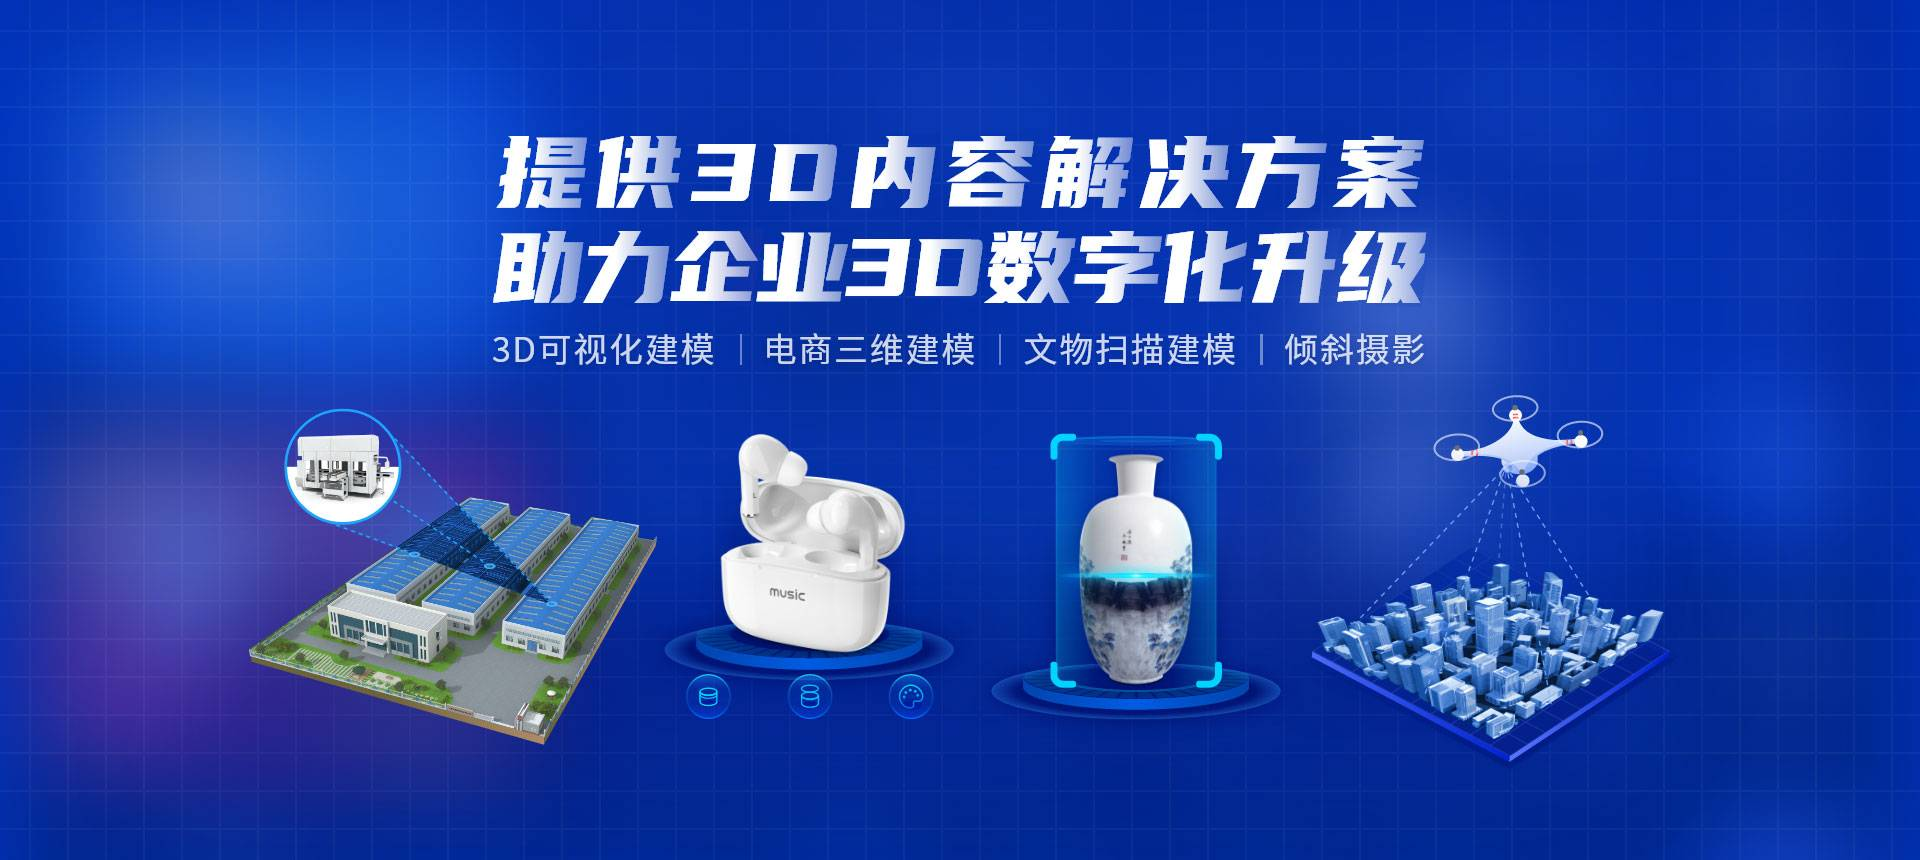 3D可视化建模,产品三维建模,3D建模,三维模型